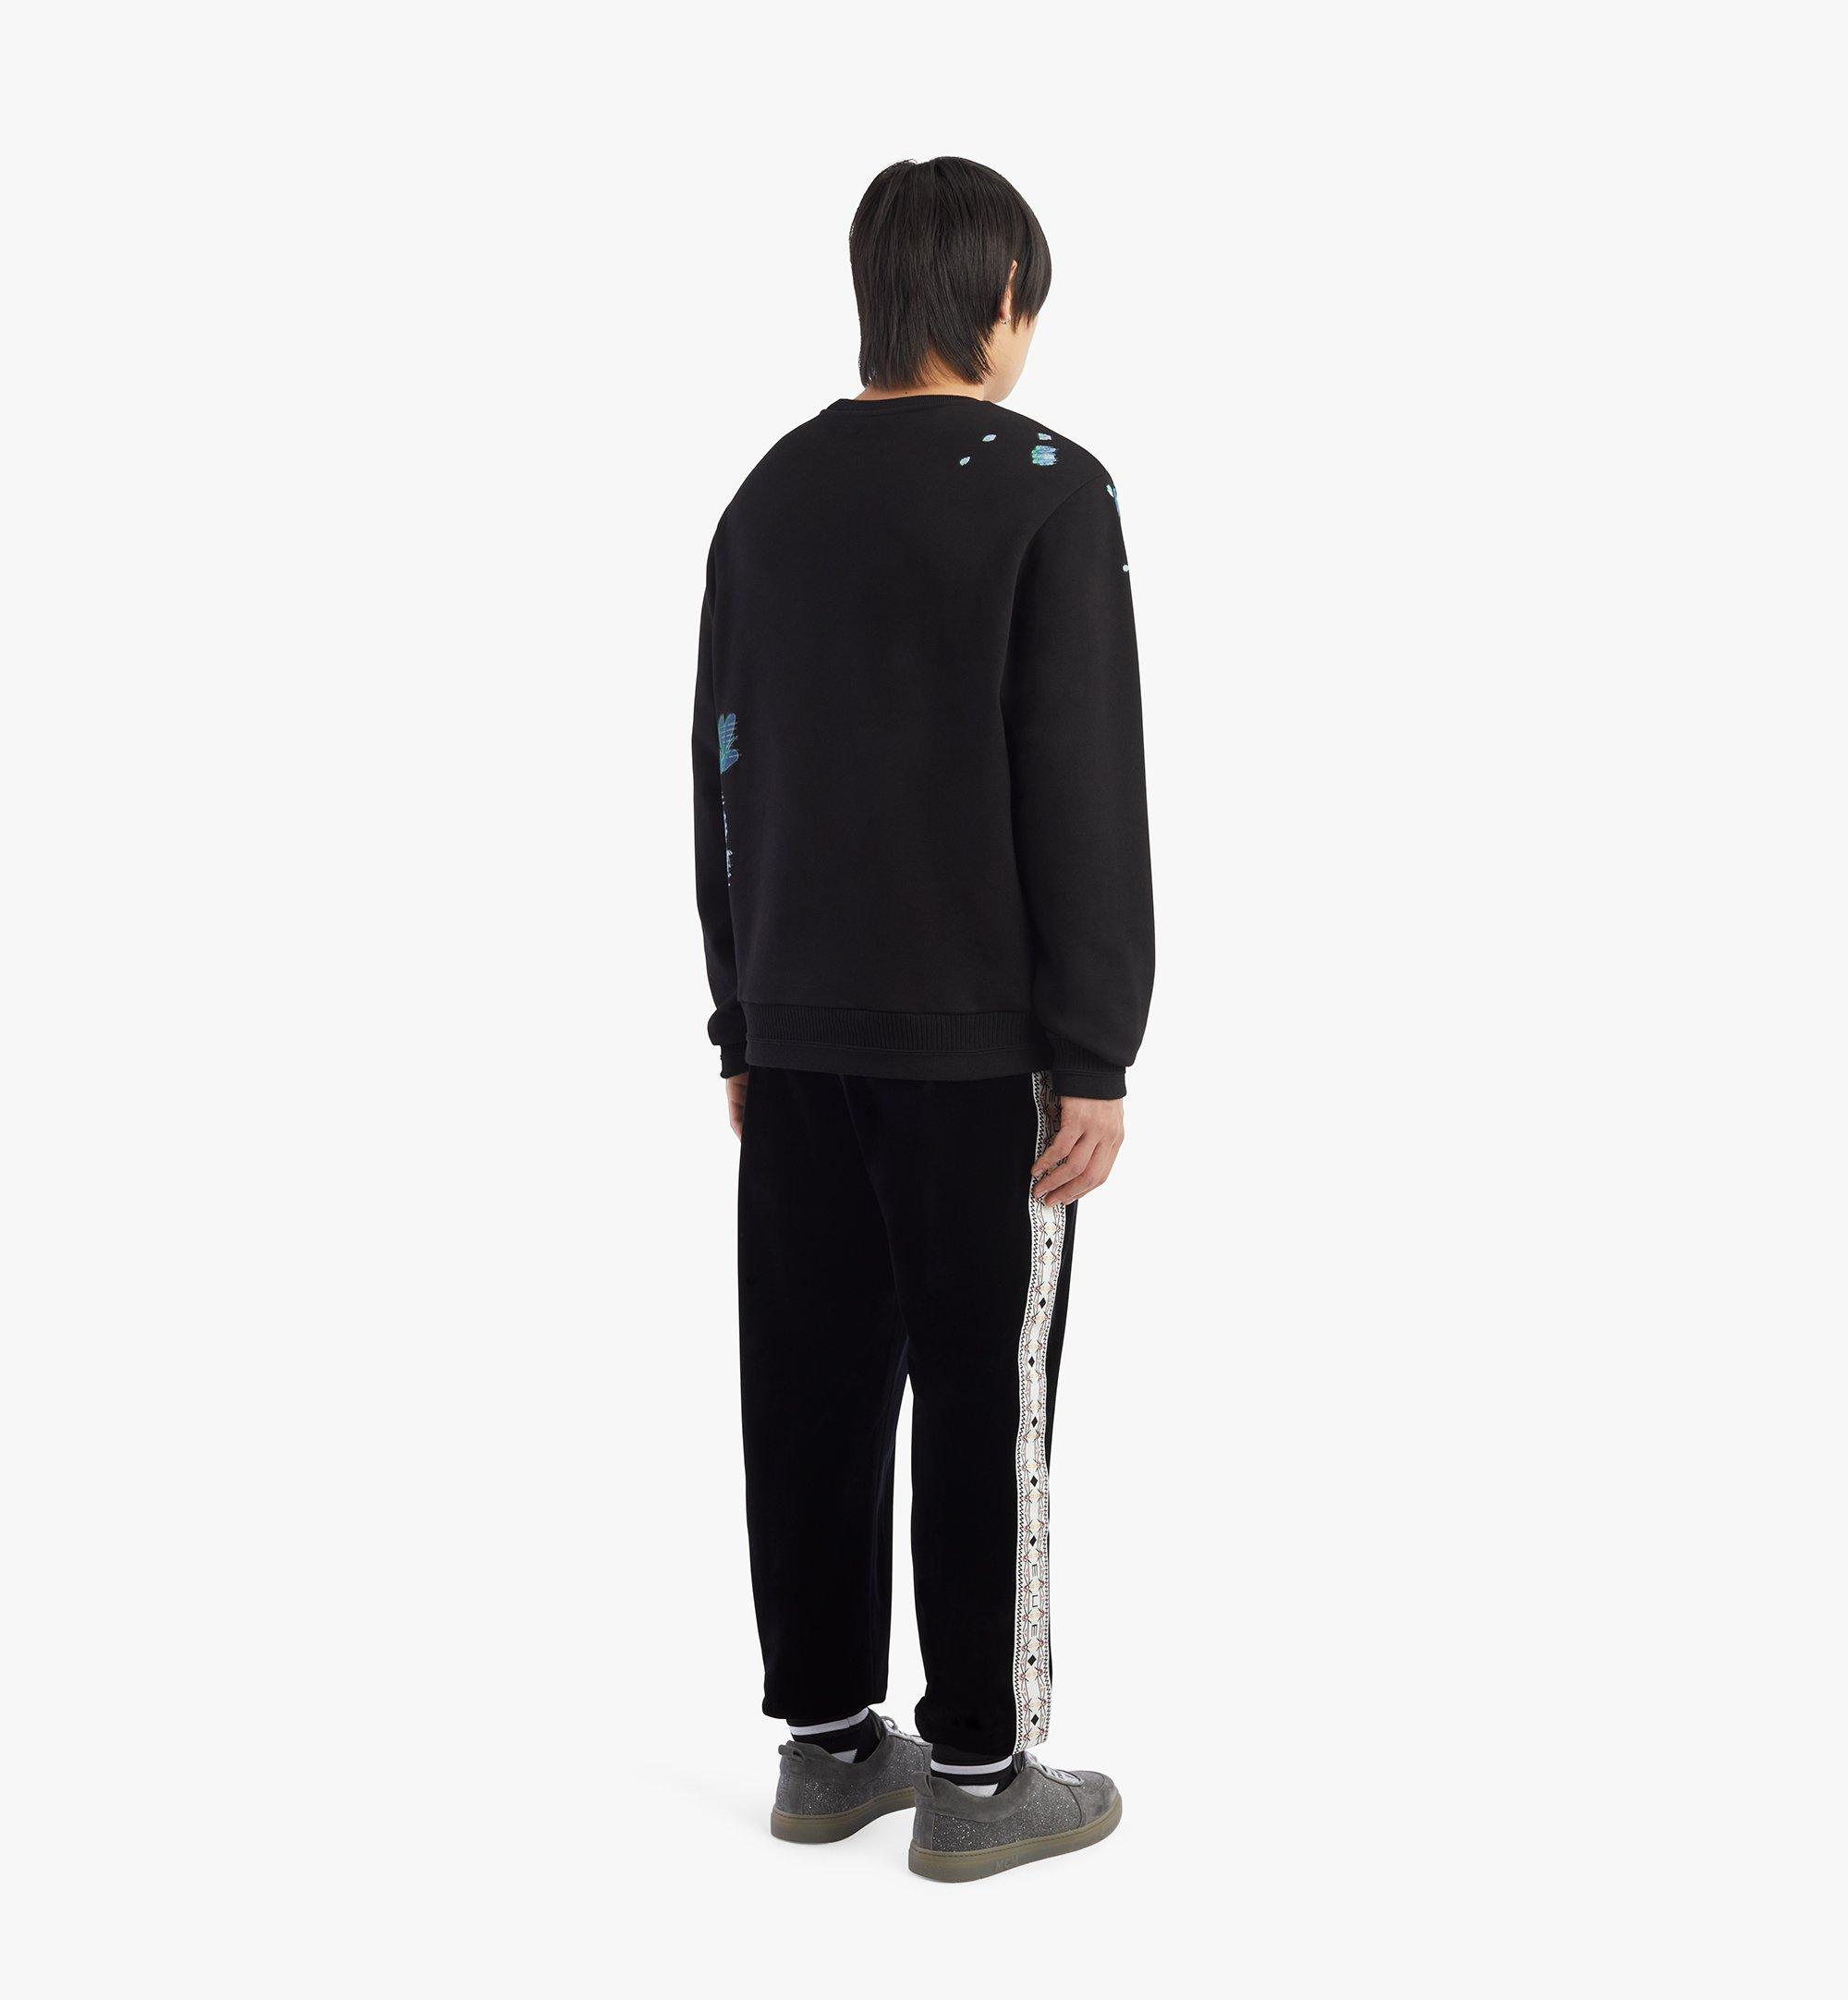 MCM 男士科技花卉印花运动衫 Black MHABSMM03BK00S 更多视角 2